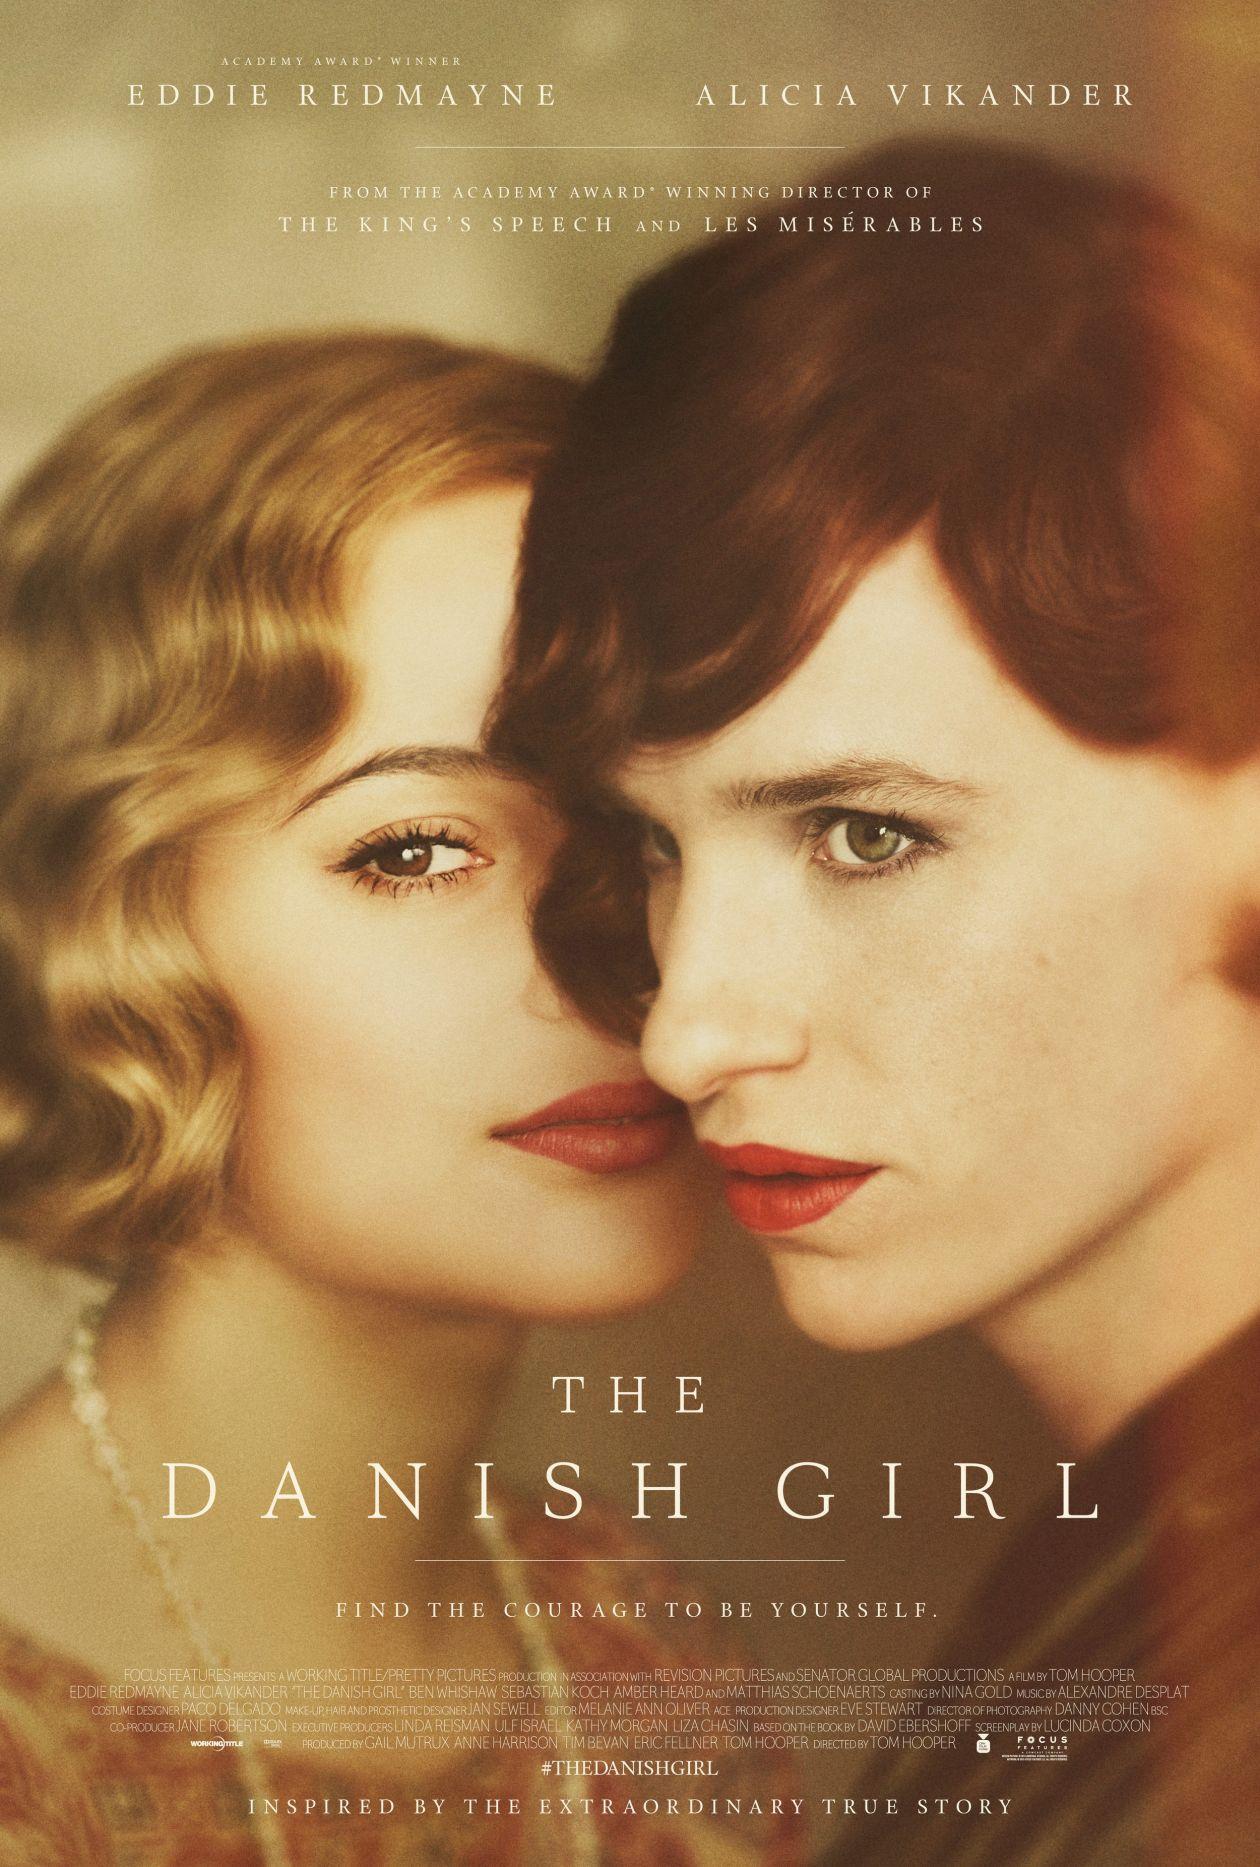 Alicia Vikander actress | The Danish Girl / Tom Hooper 2015 movie poster / Affiche film